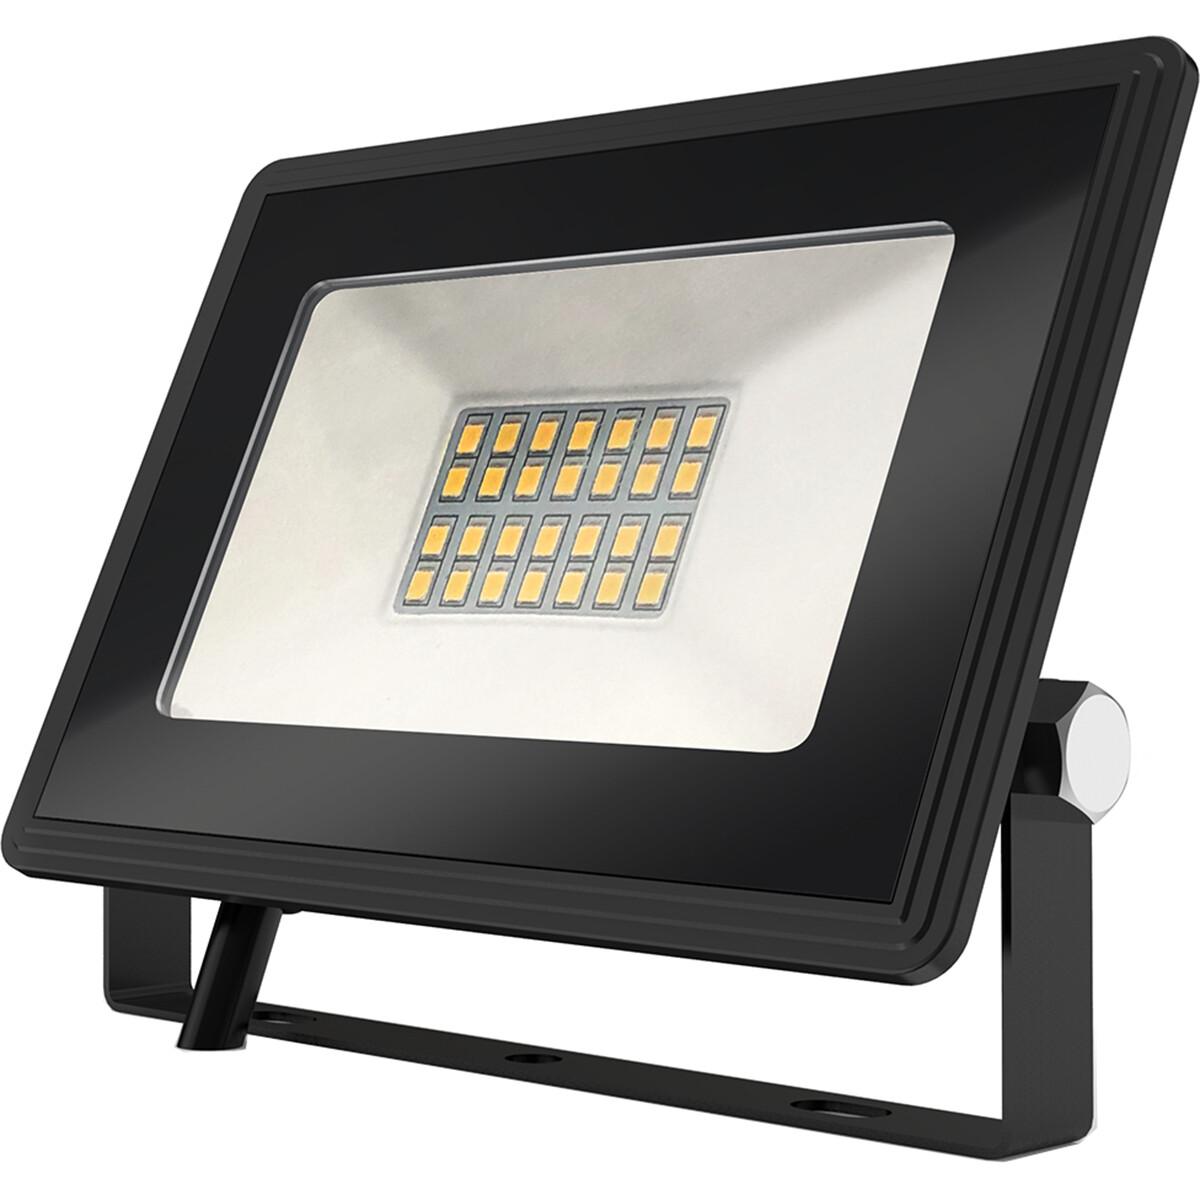 LED Bouwlamp 20 Watt - LED Schijnwerper - Aigi Iglo - Natuurlijk Wit 4000K - Waterdicht IP65 - Mat Zwart - Aluminium